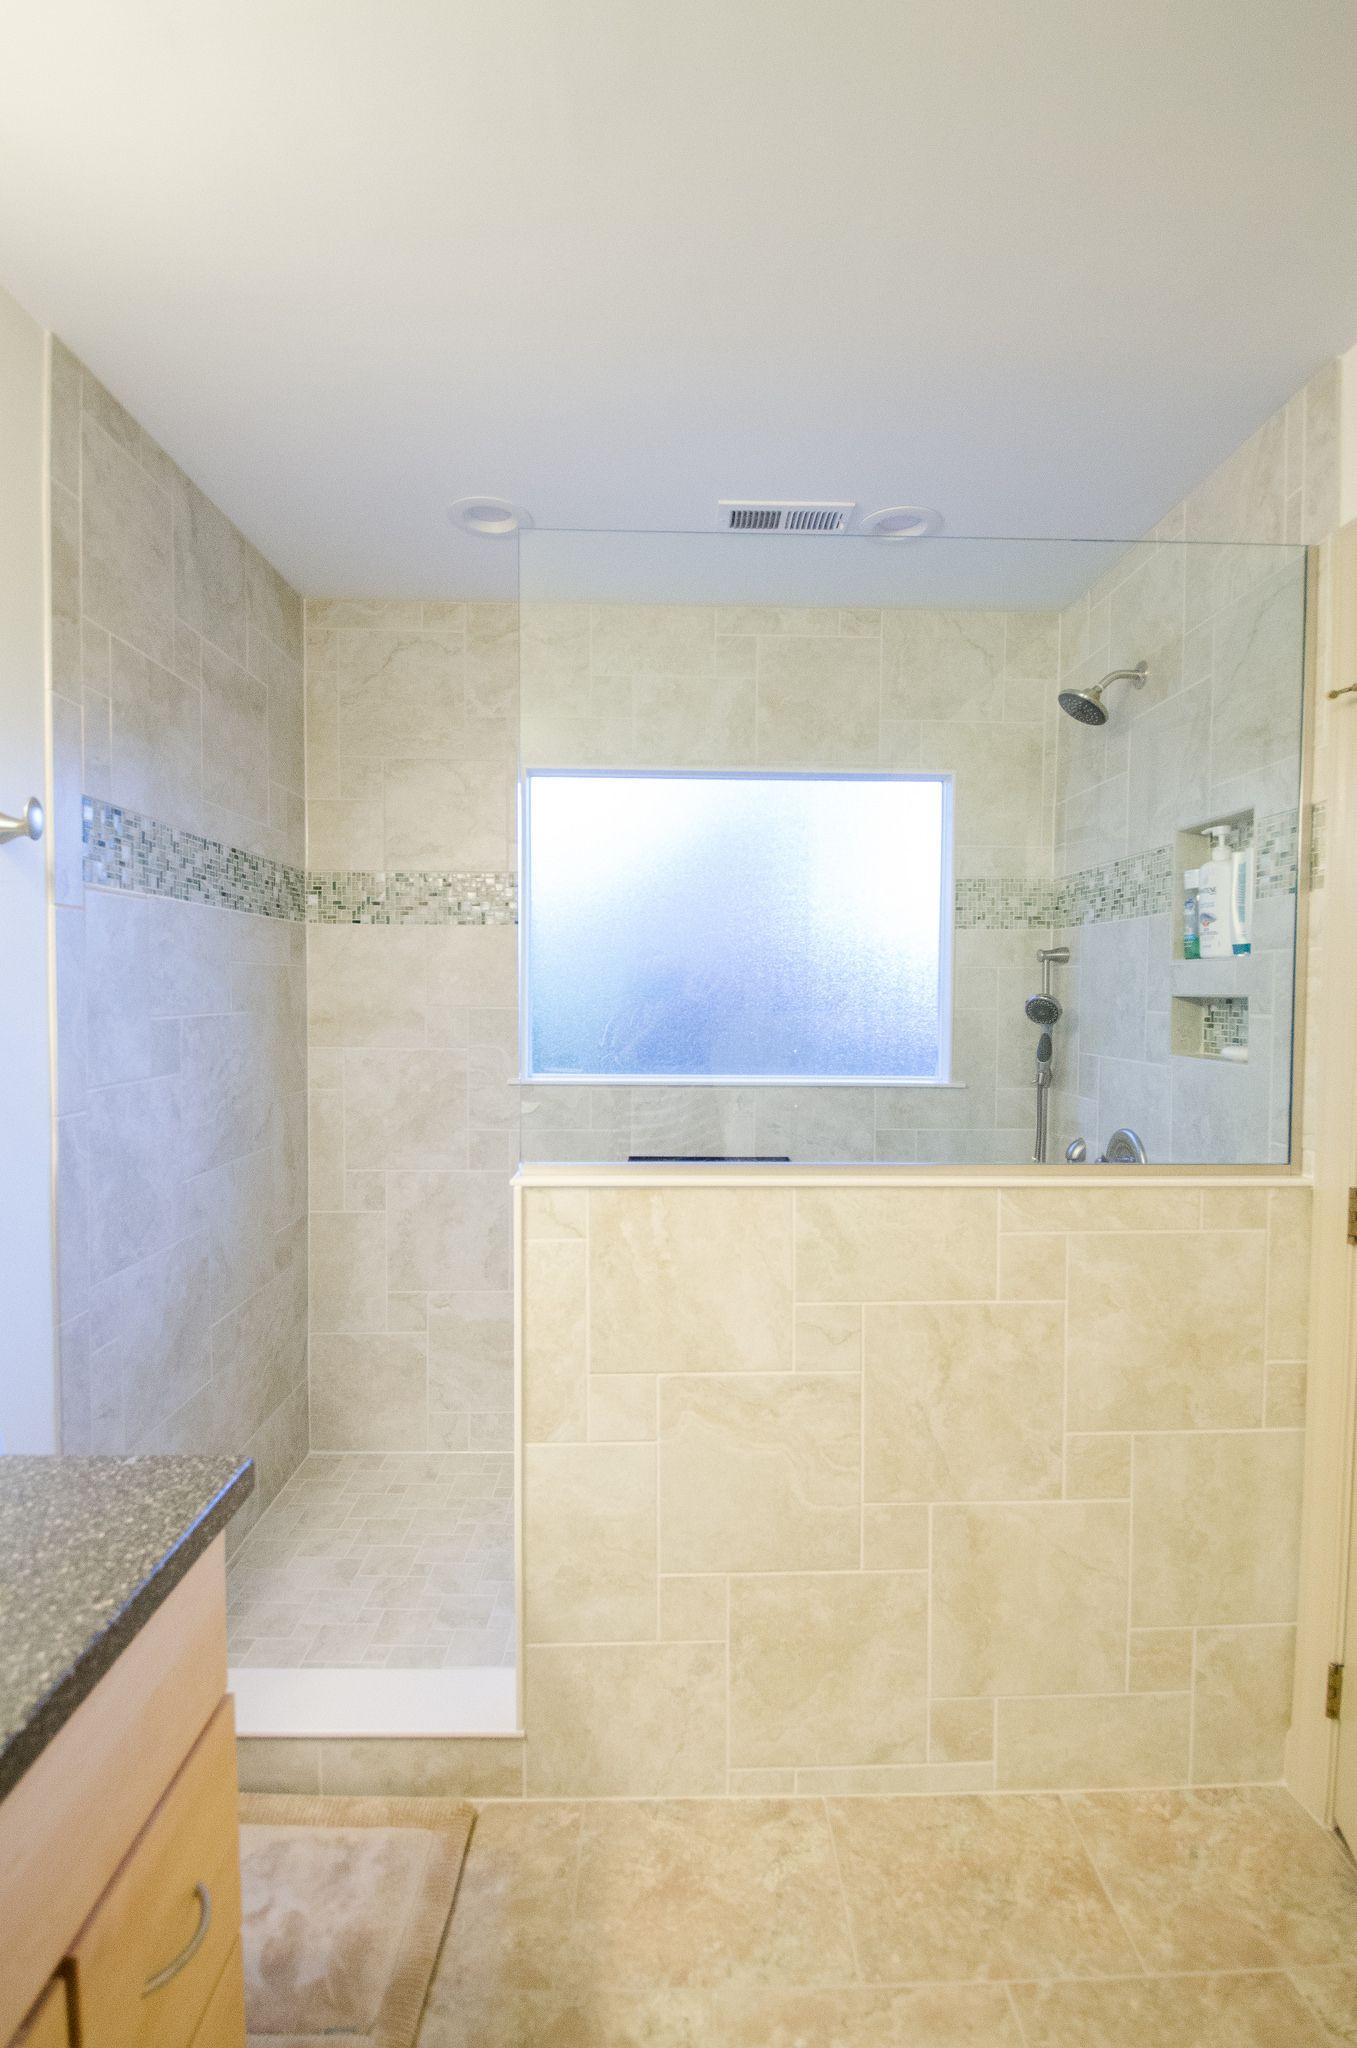 . CN642   AFTER  0076 in 2019   Bathroom Remodel Ideas   Bathroom